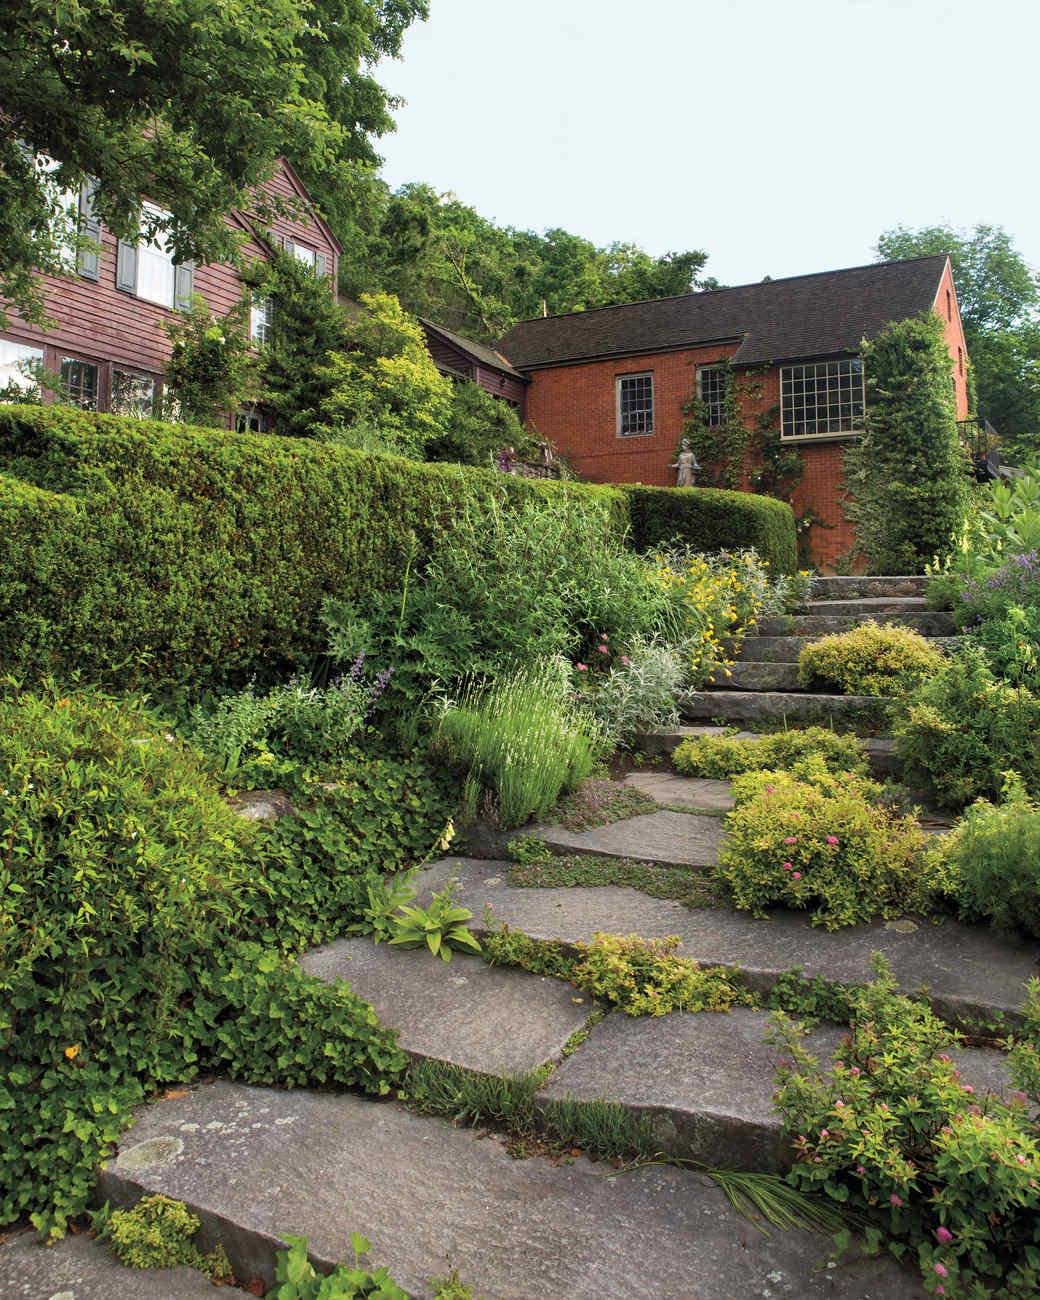 stone-brick-hollister-house-8276-md109020.jpg